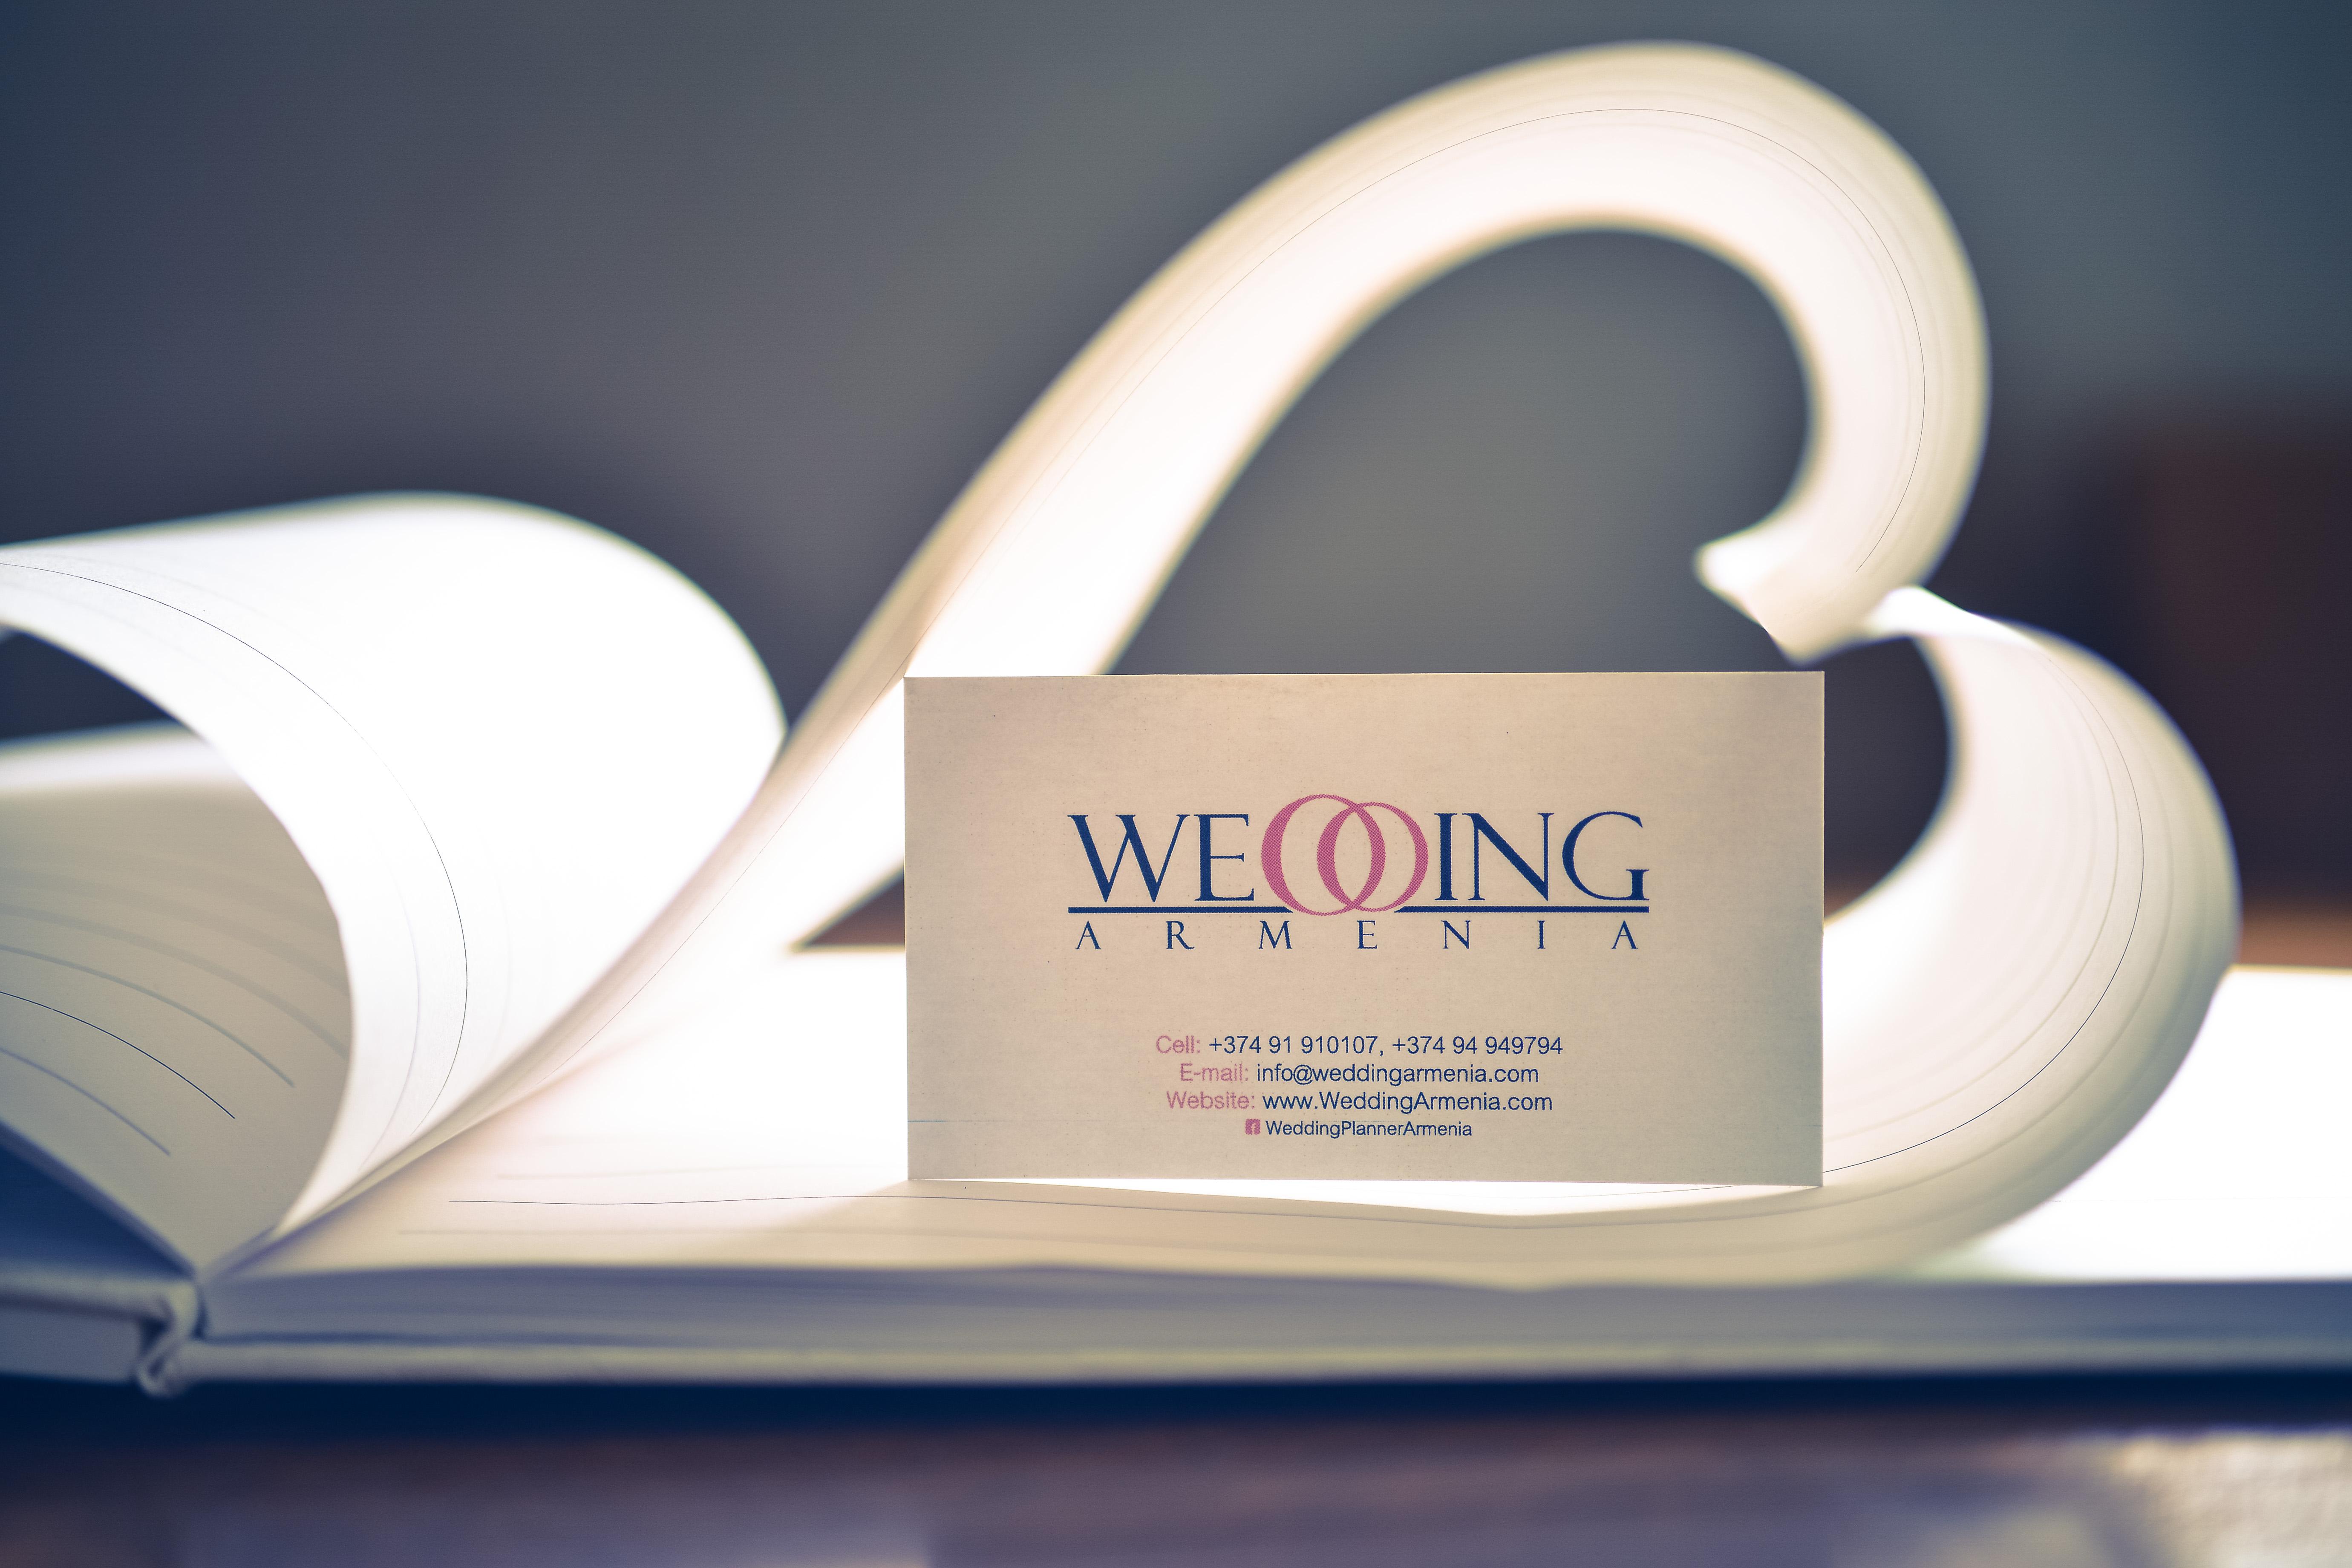 The Best Open Air Weddings By Weddingarmenia News Armenian Hugo Boss Endrio Hitam